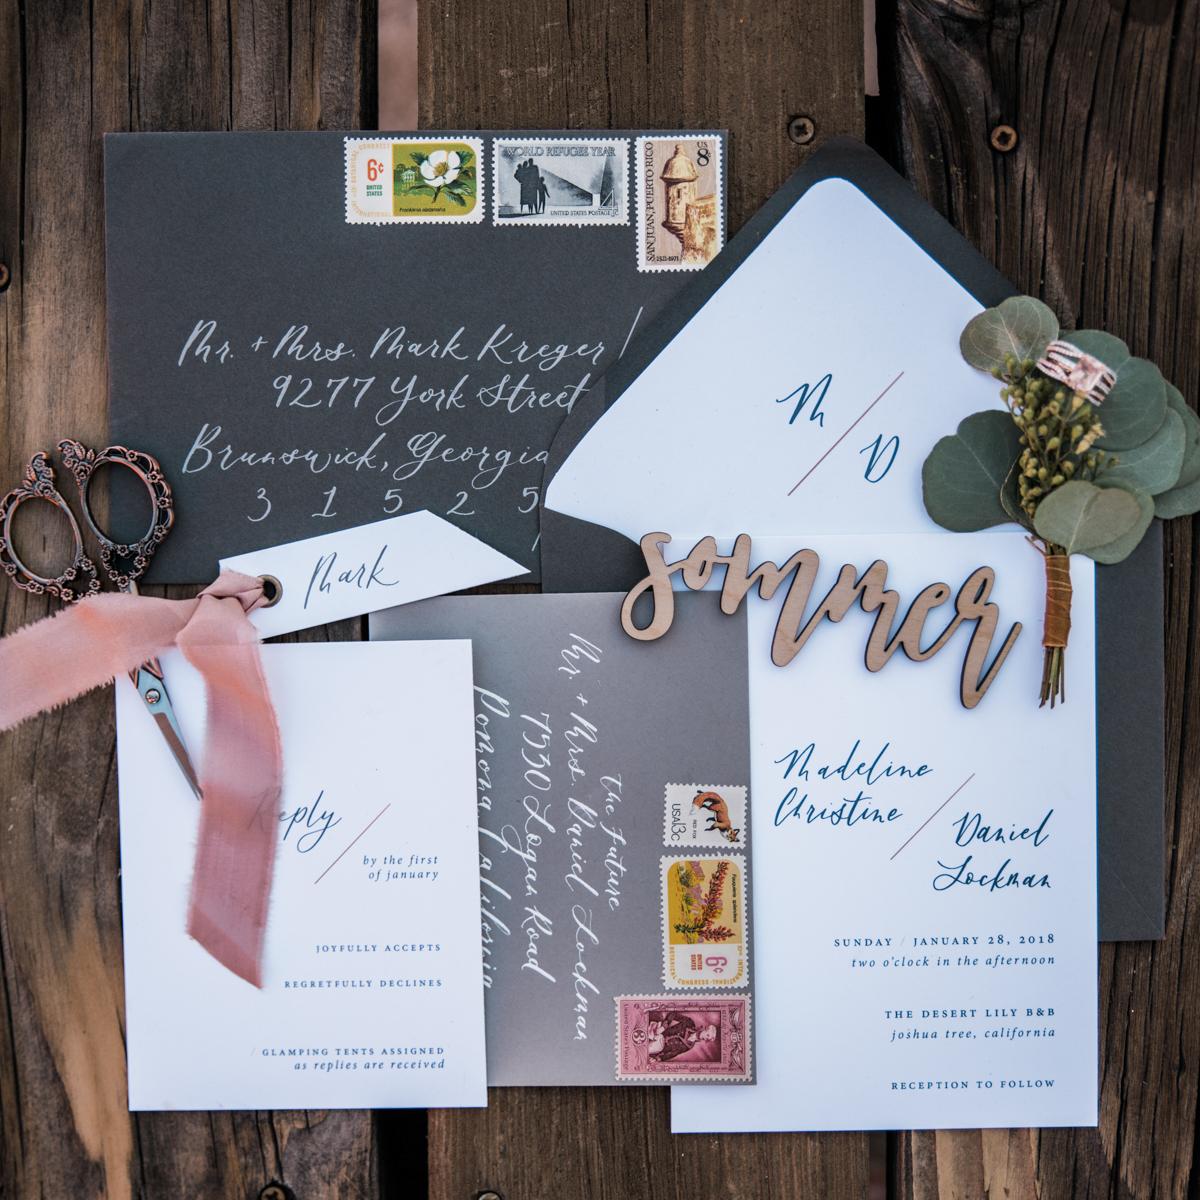 multi-cultural desert elopement invitations and envelopes with decorative scissors